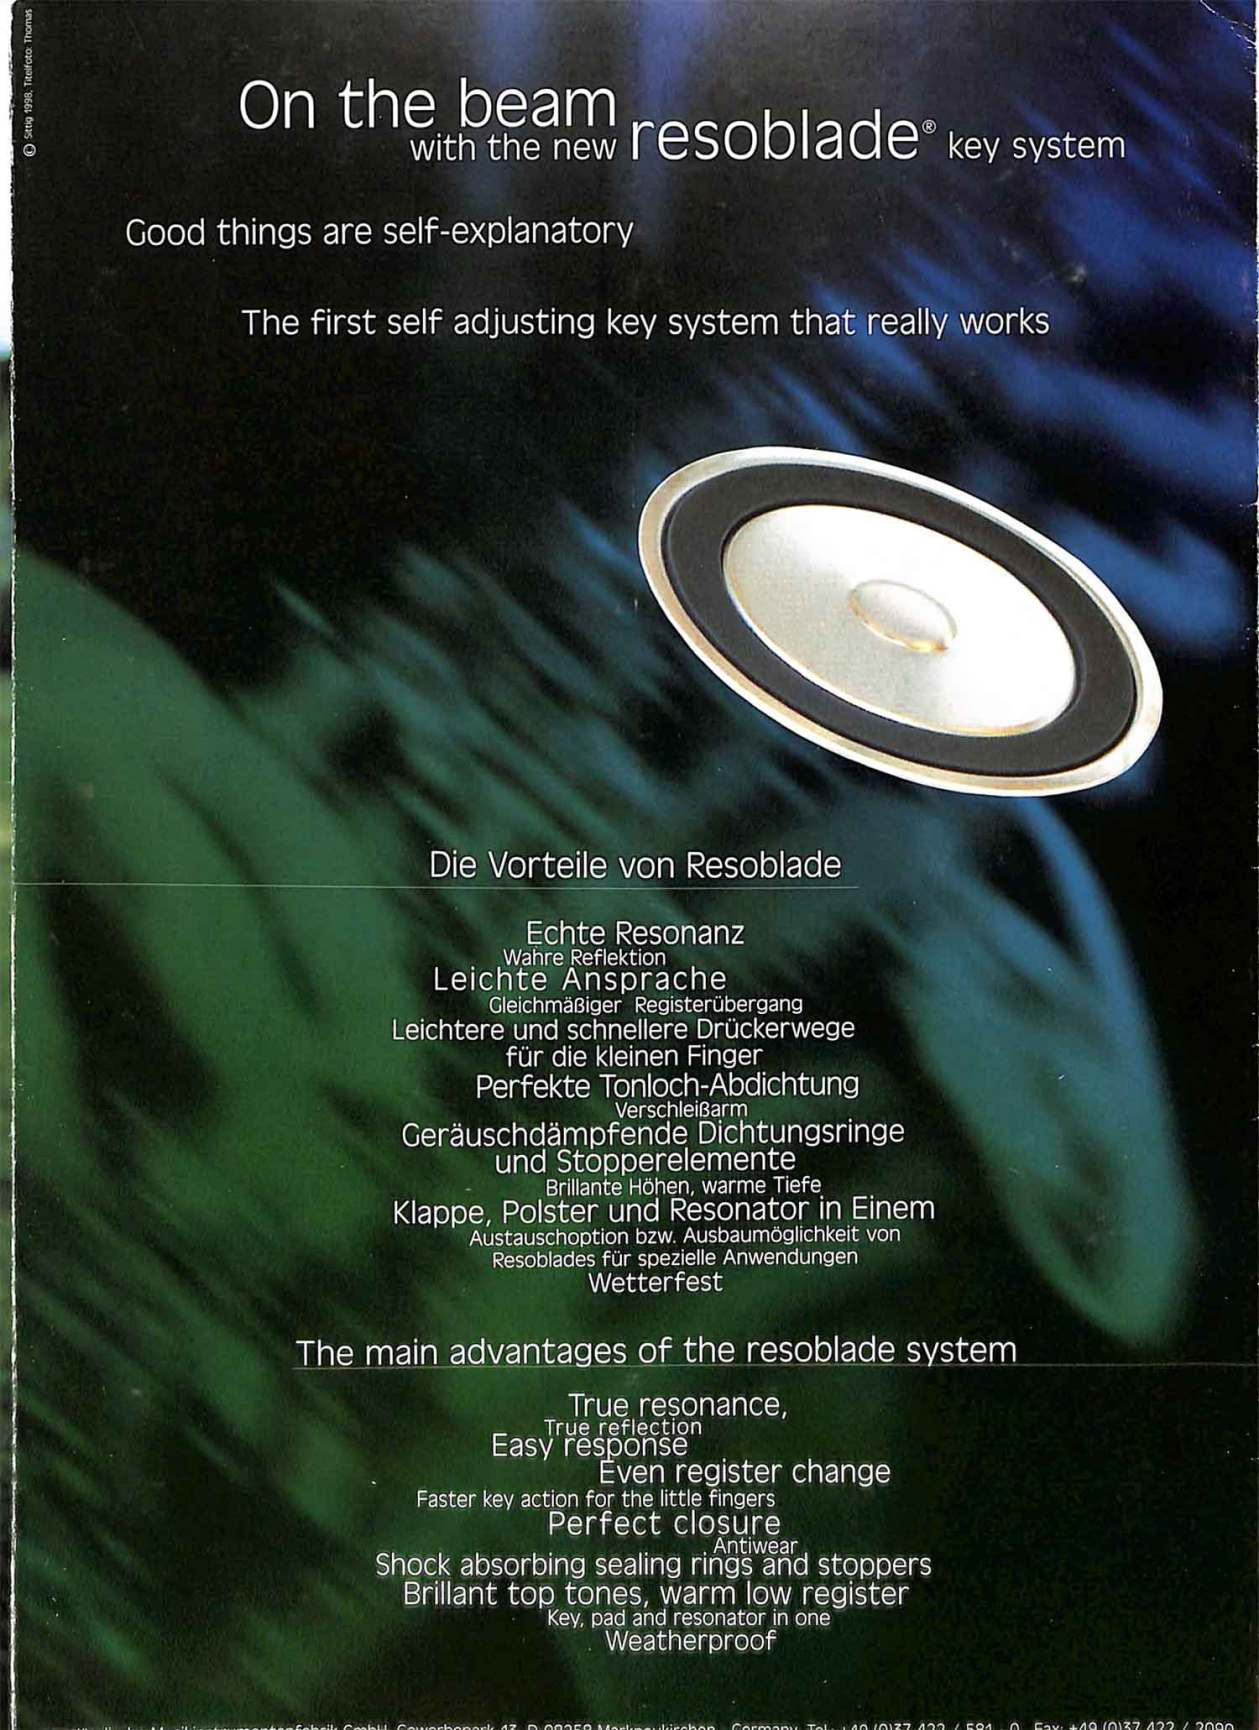 B&S saxophone, Codera, German saxophone, color brochure, resoblade